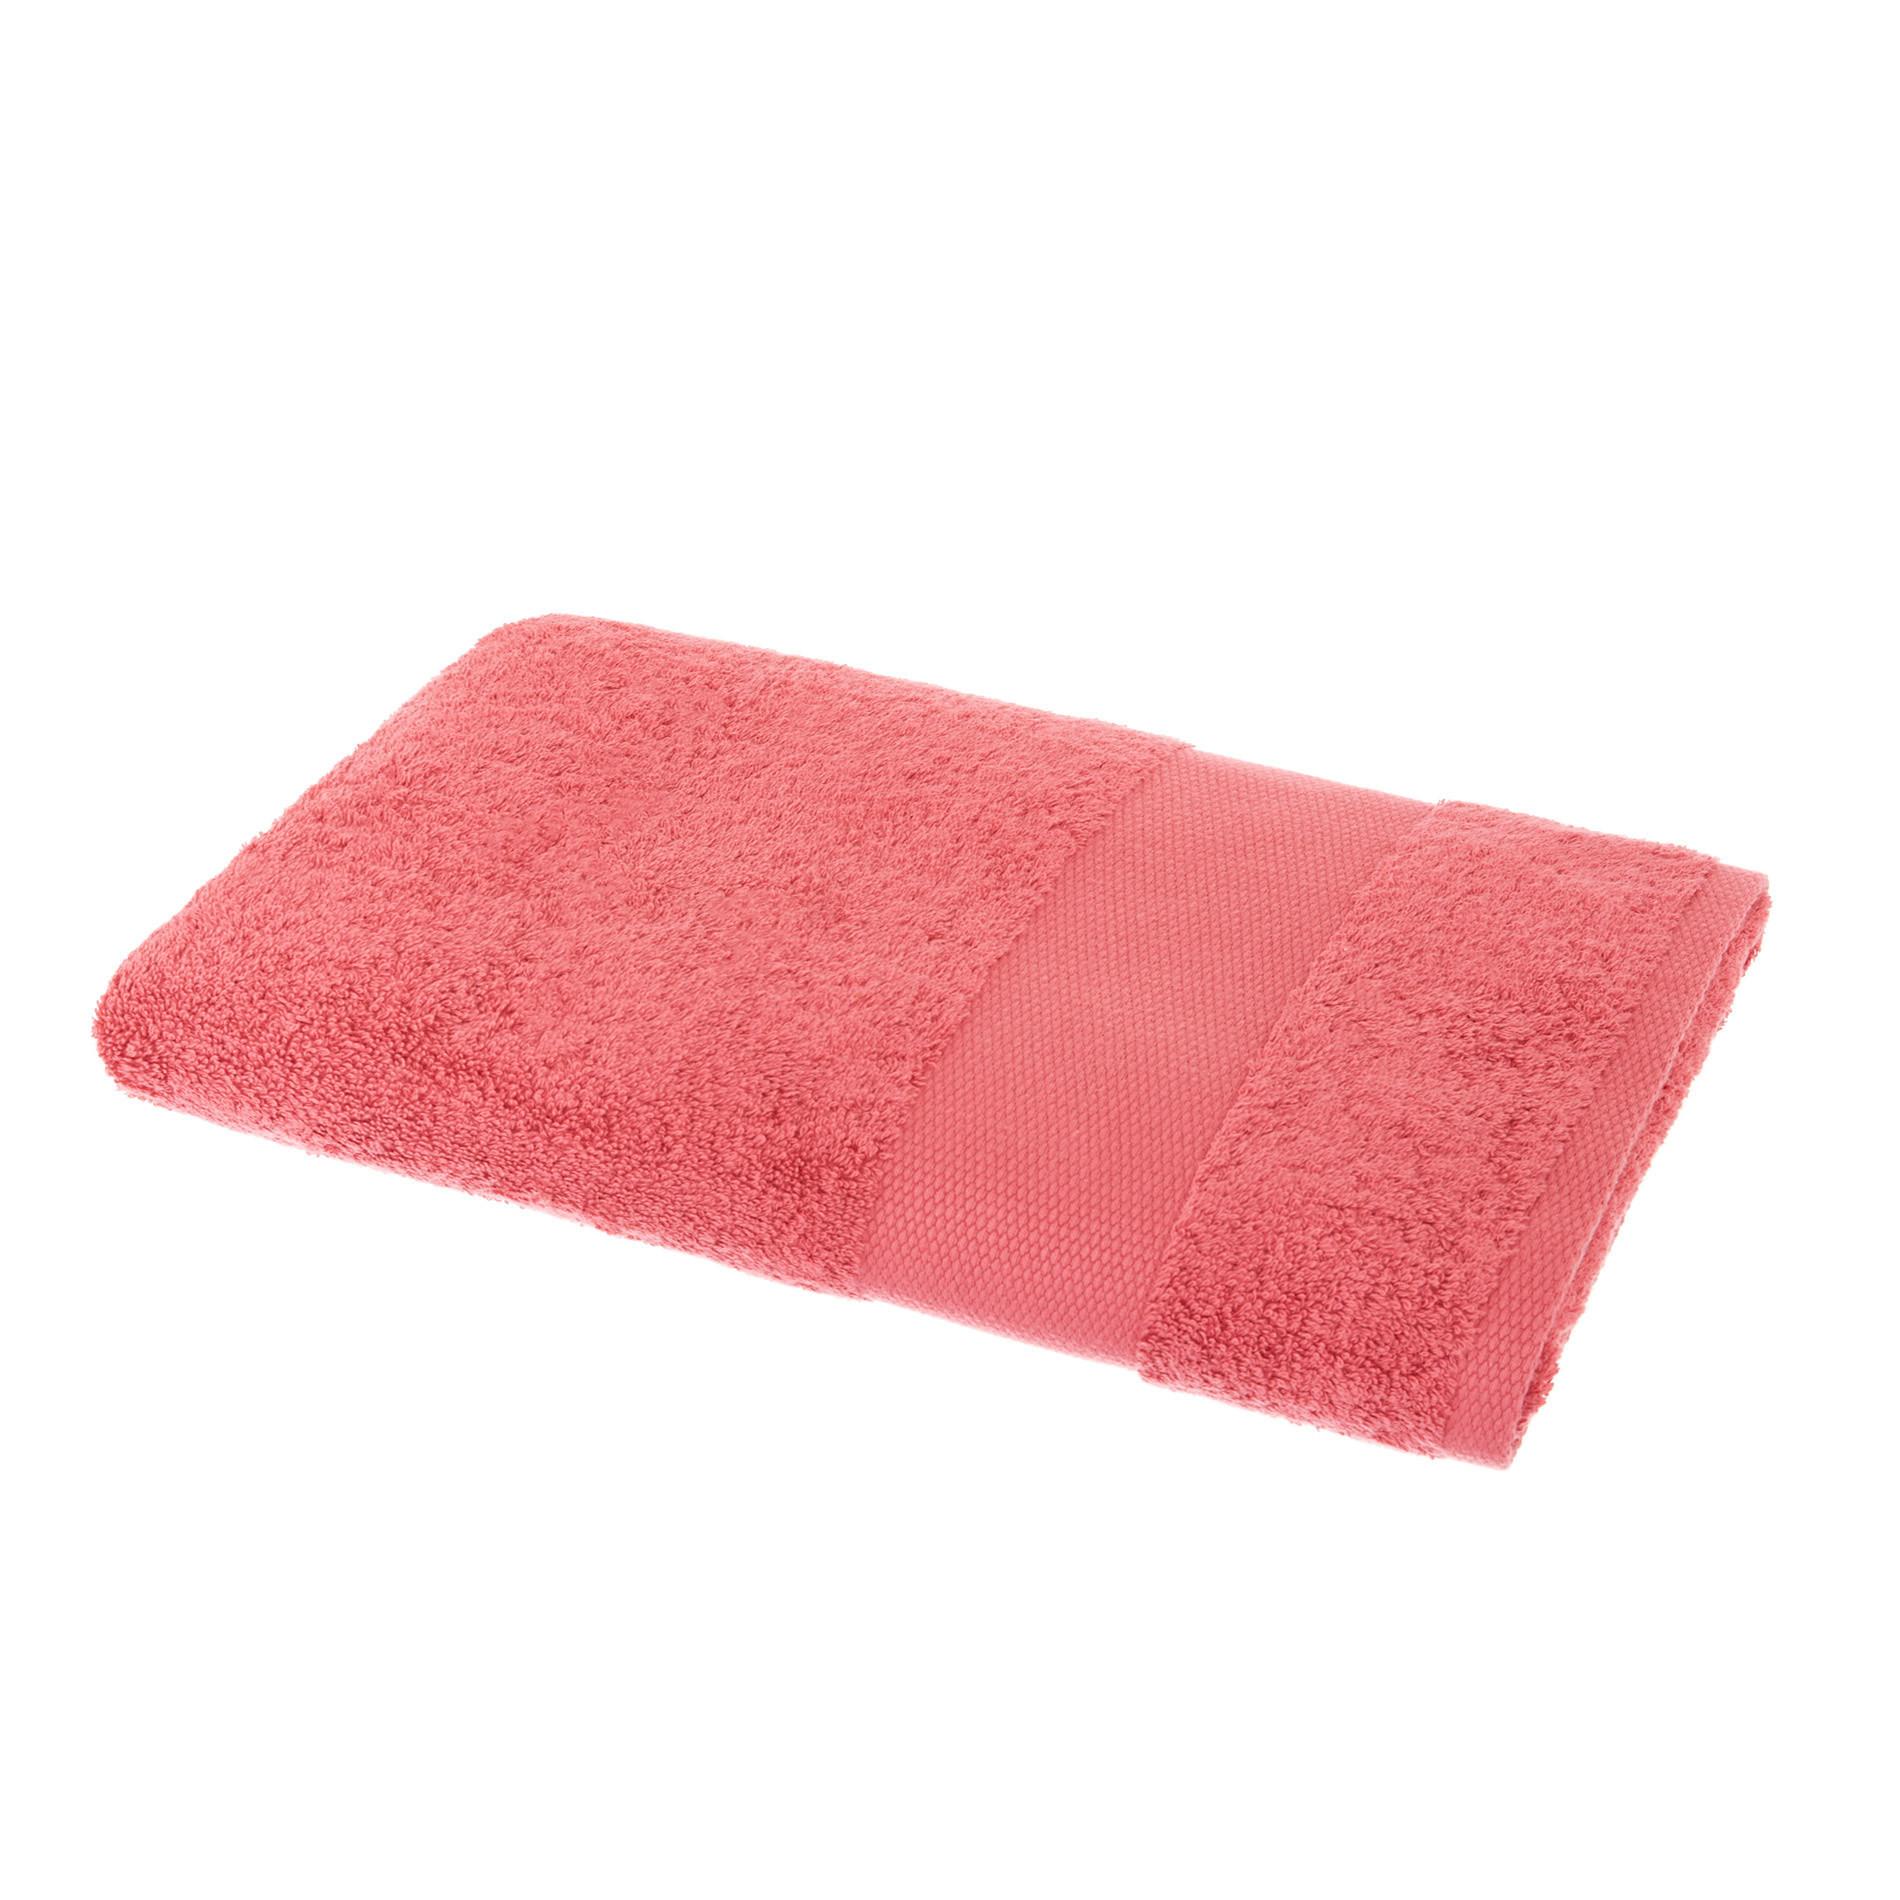 Asciugamano spugna di puro cotone Zefiro, Rosso fragola, large image number 1